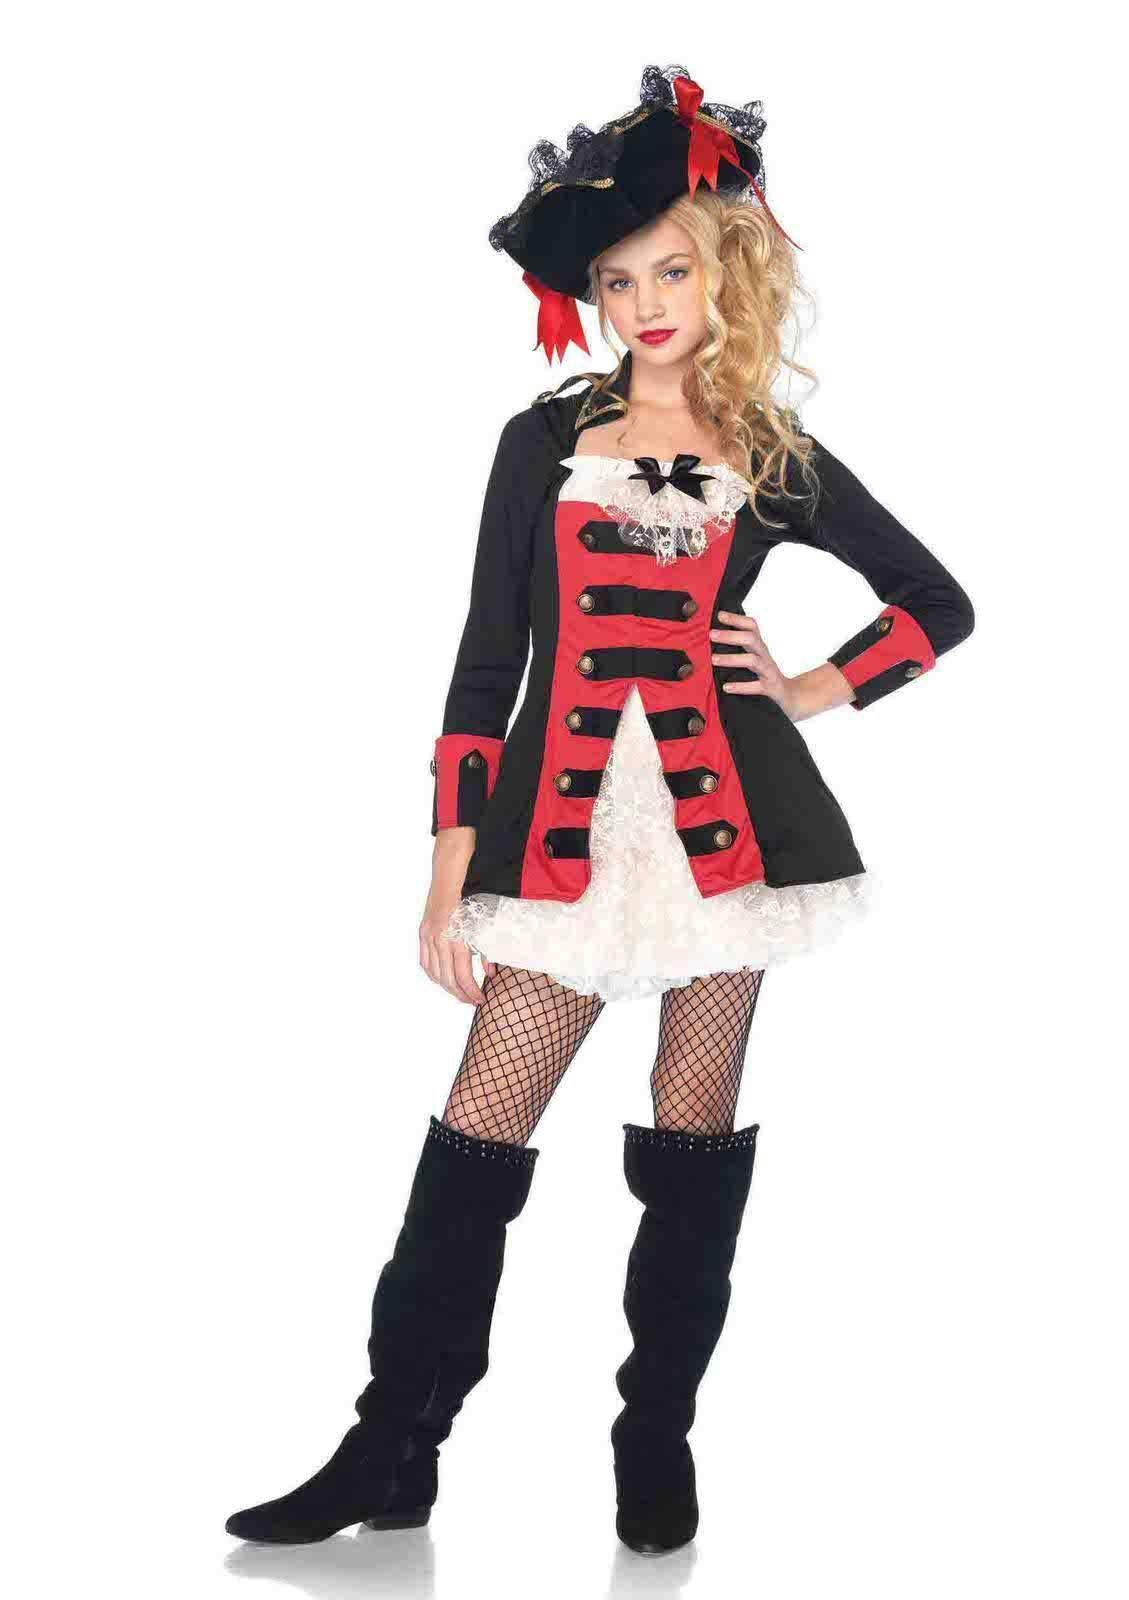 pretty pirate captain waistcoat dress costume | products | pinterest